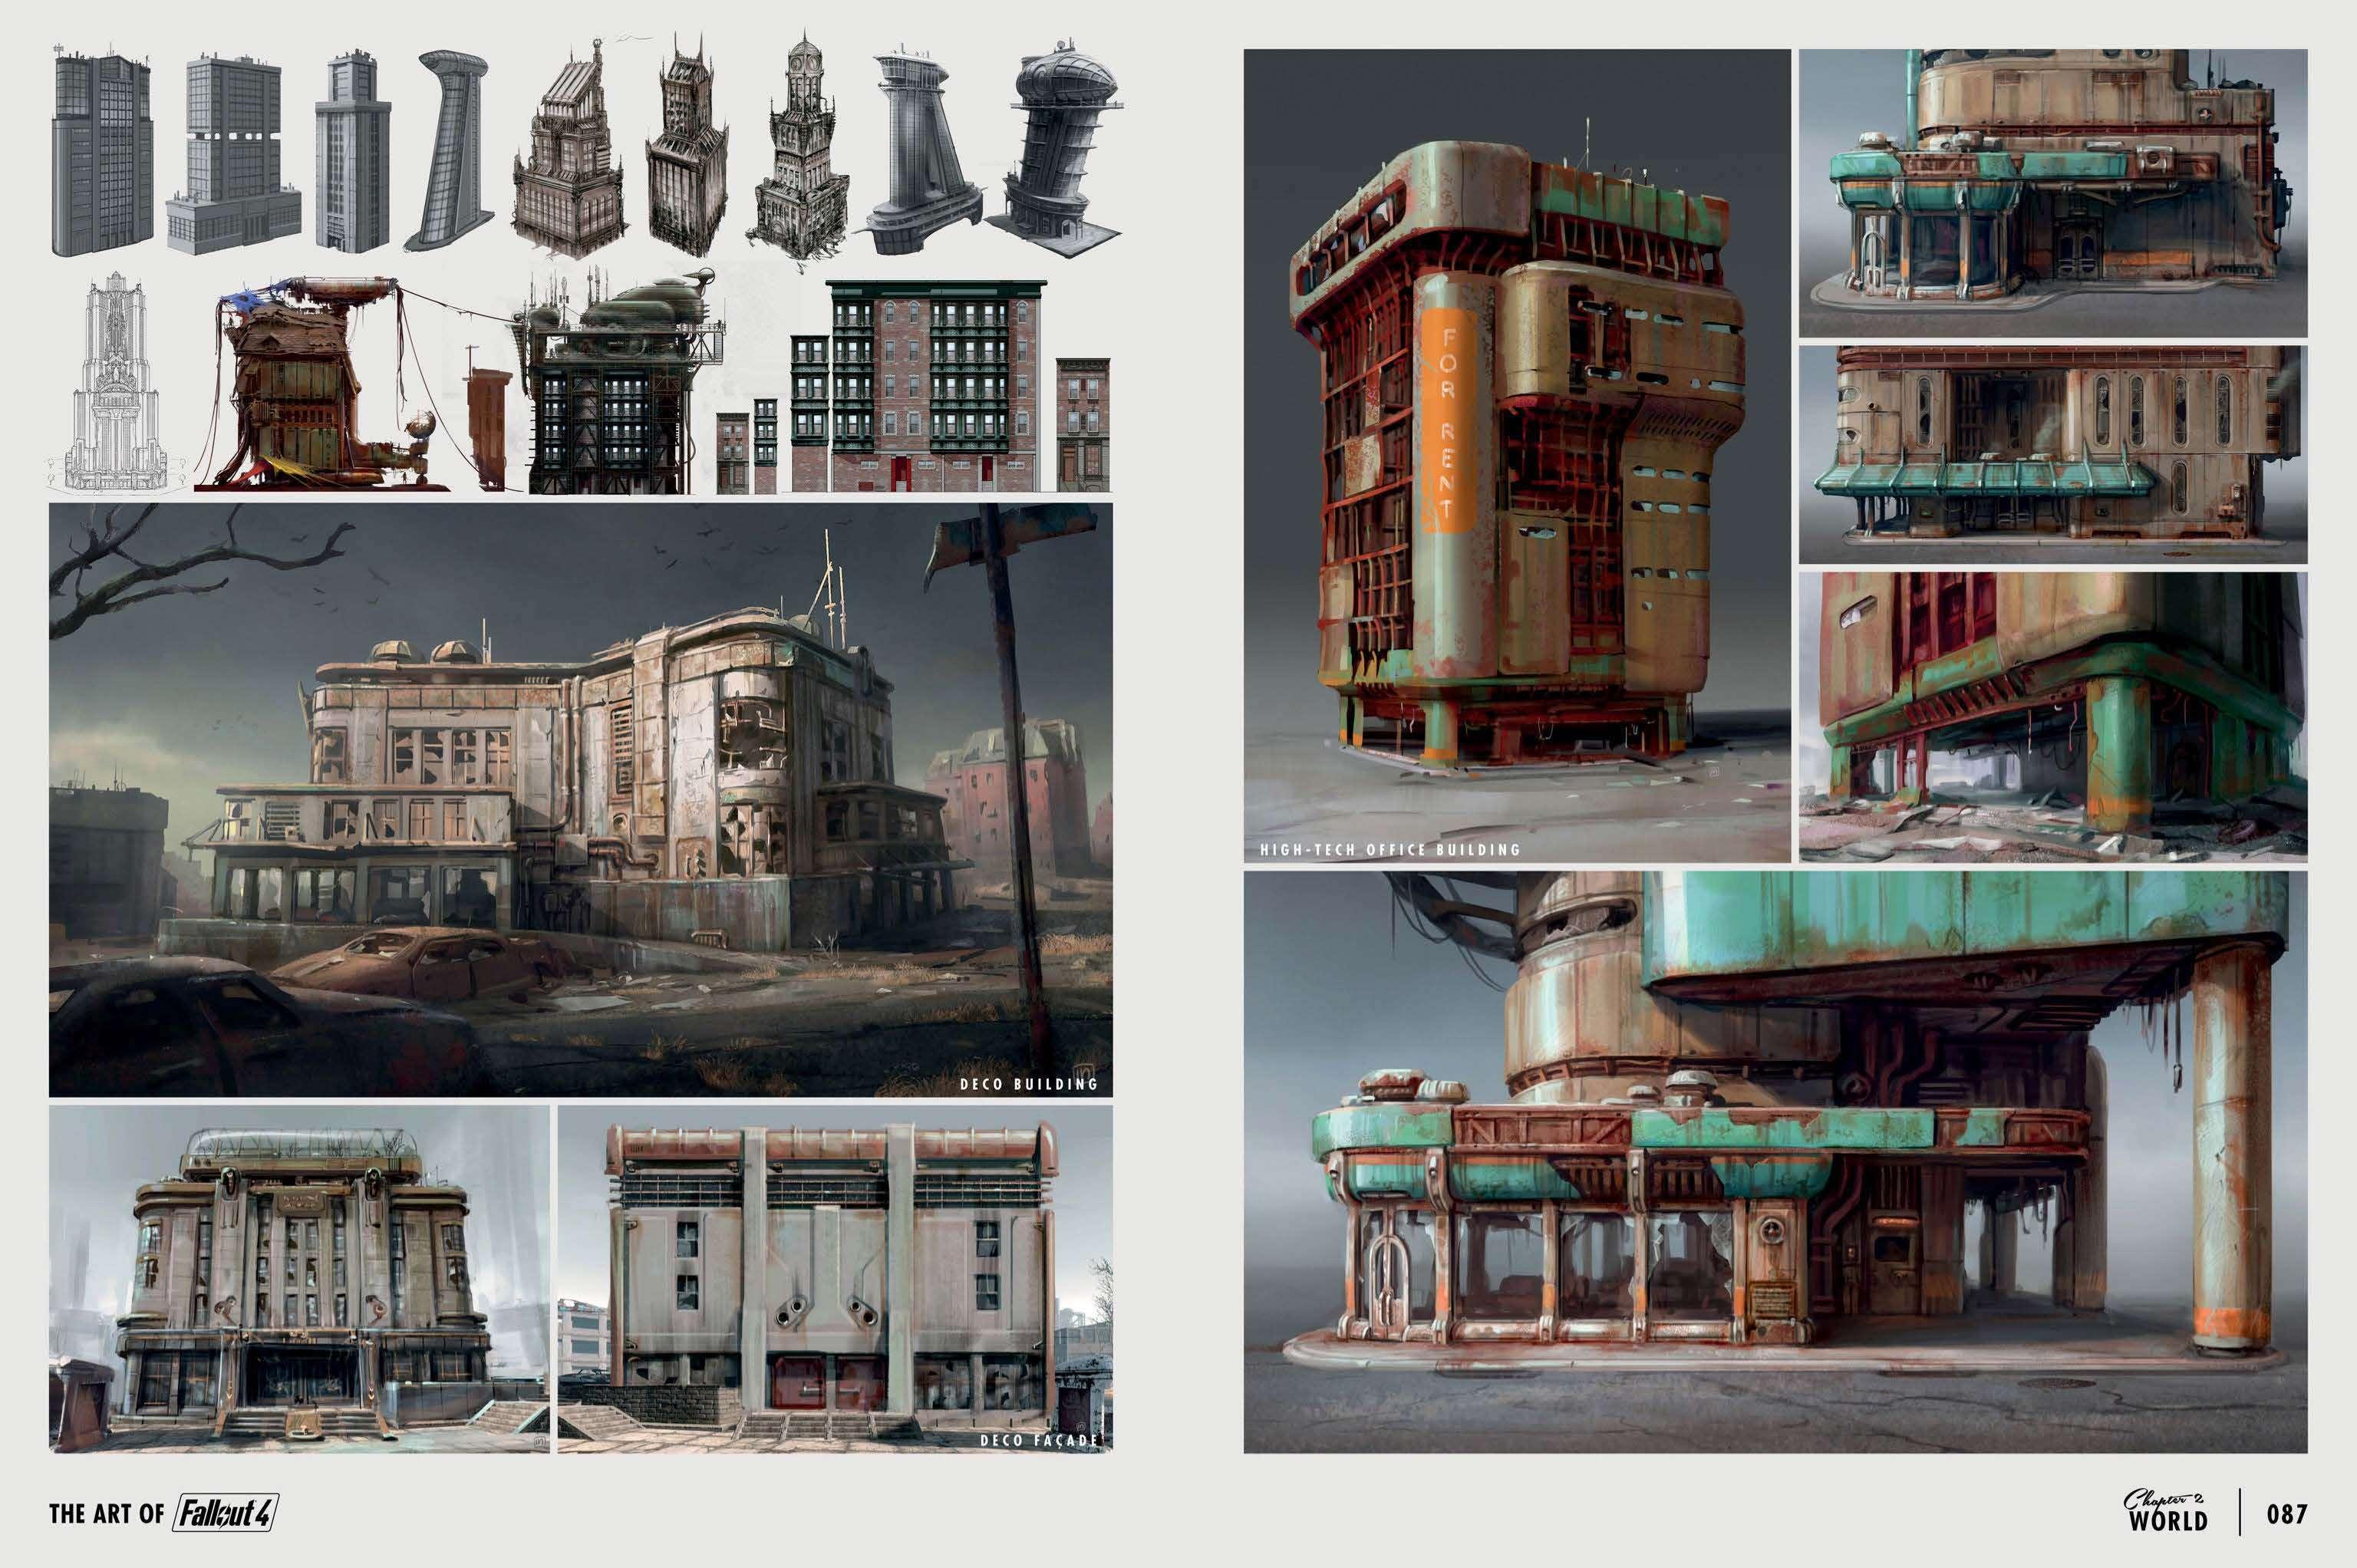 The Art of Fallout 4 - # 044 - Fallout 4 арт